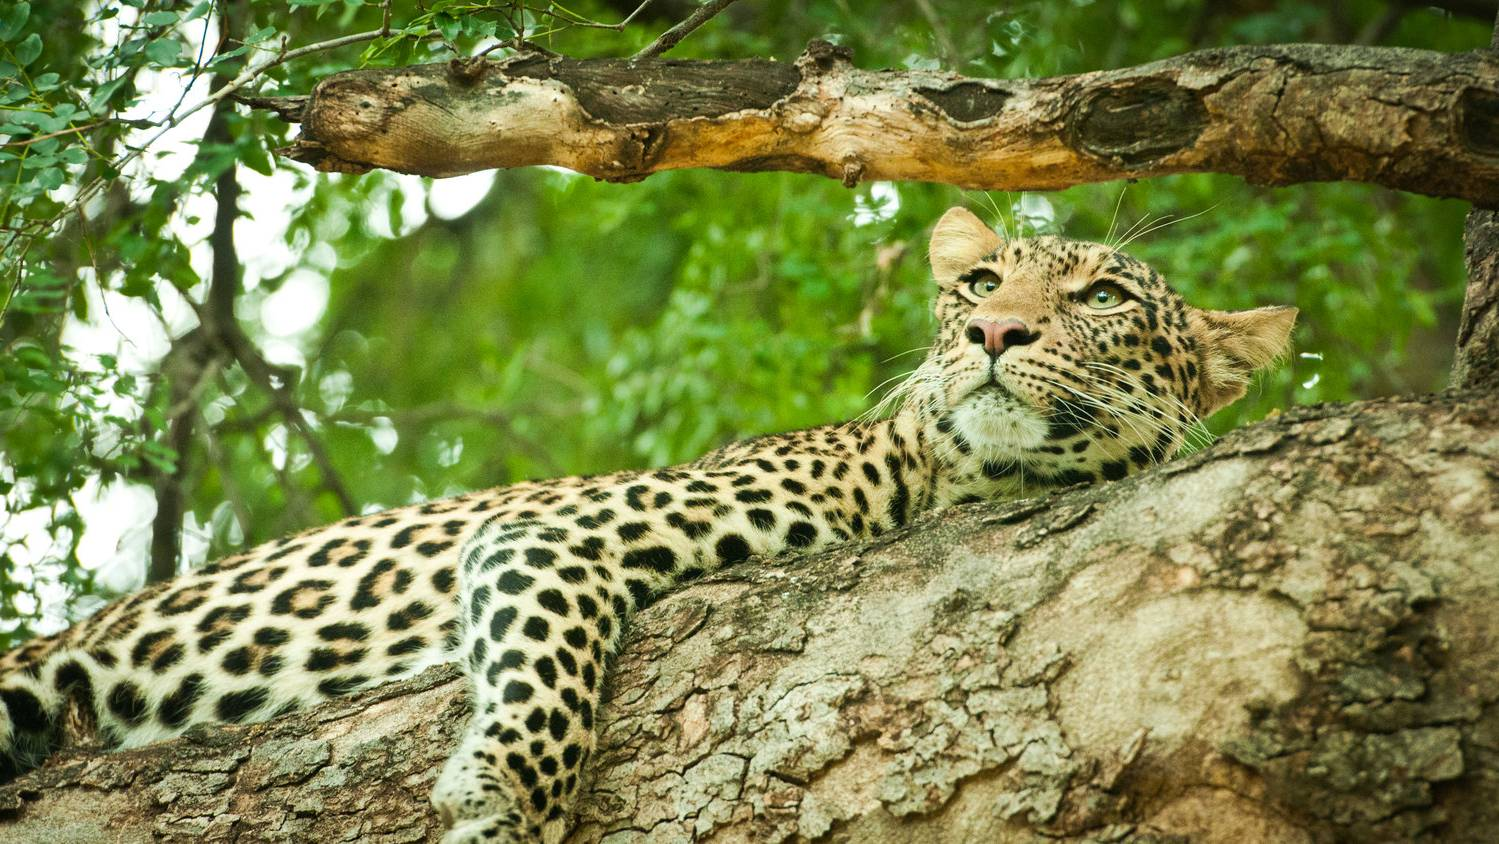 Botswana-Leopard-by-Simon-Bellingham-e1566894839622